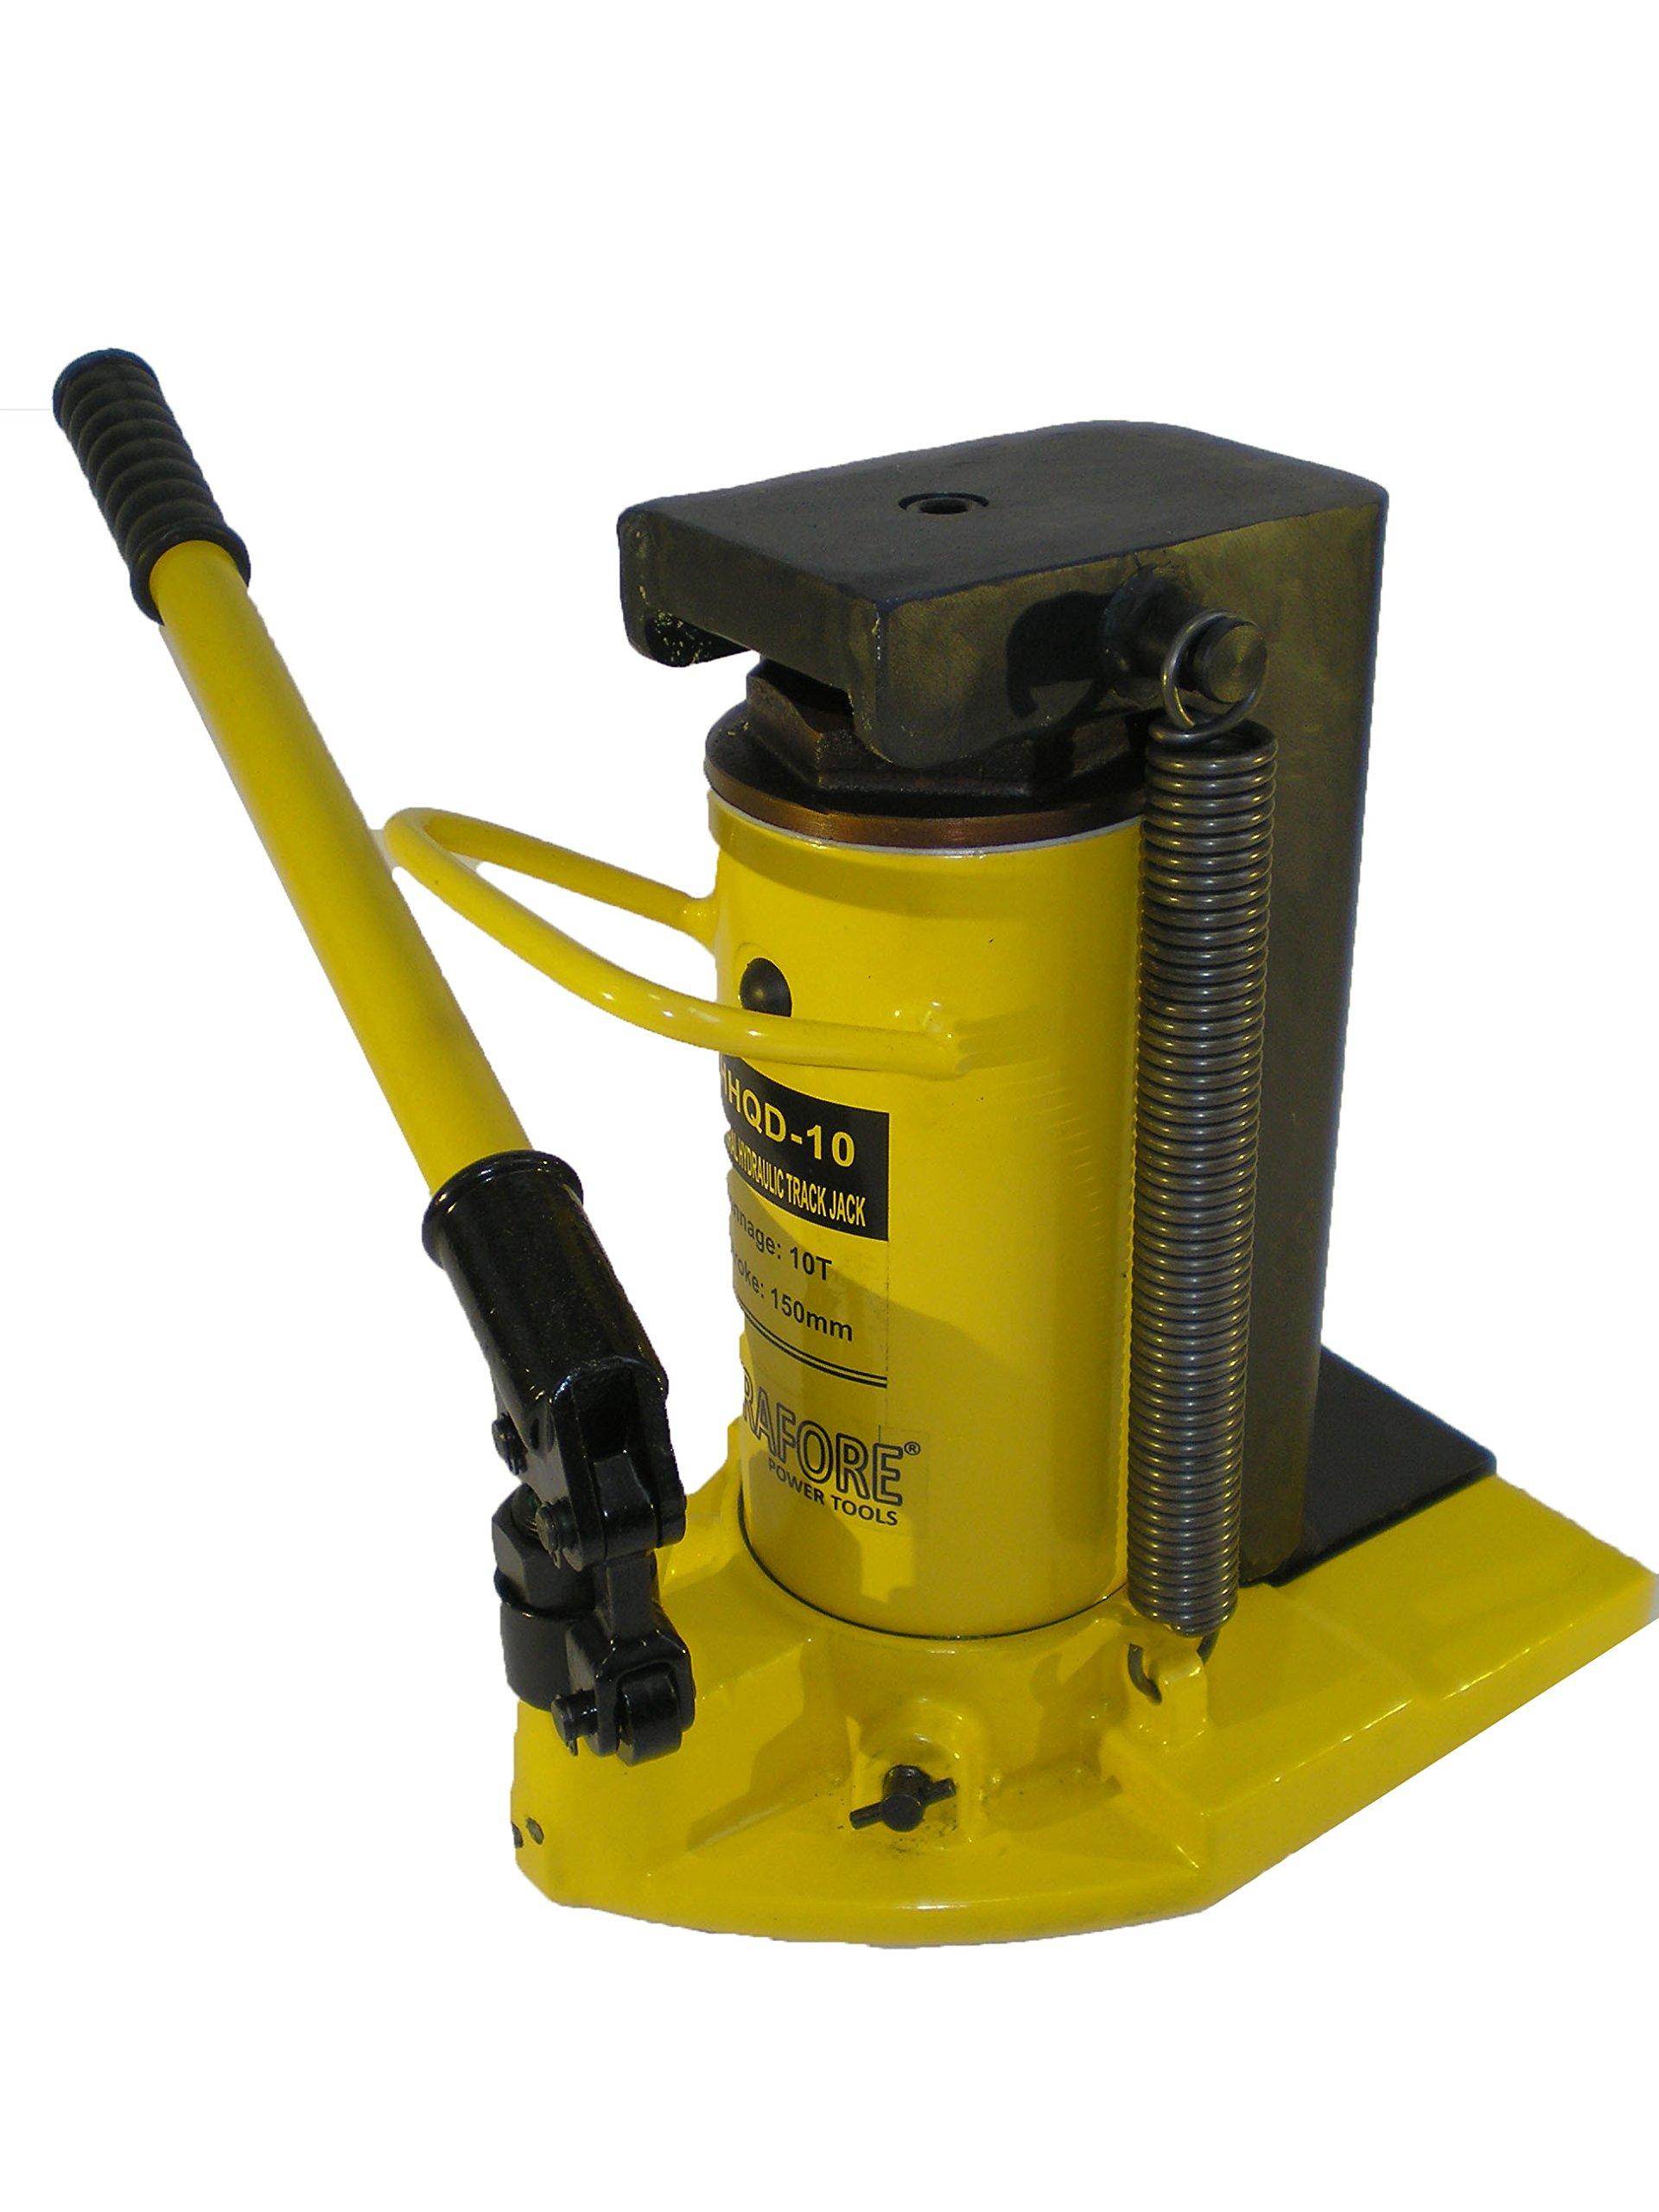 10 Ton Hydraulic Toe Jack Ram Machine Lift Cylinder QD-10 by HYDRAFORE (Image #2)